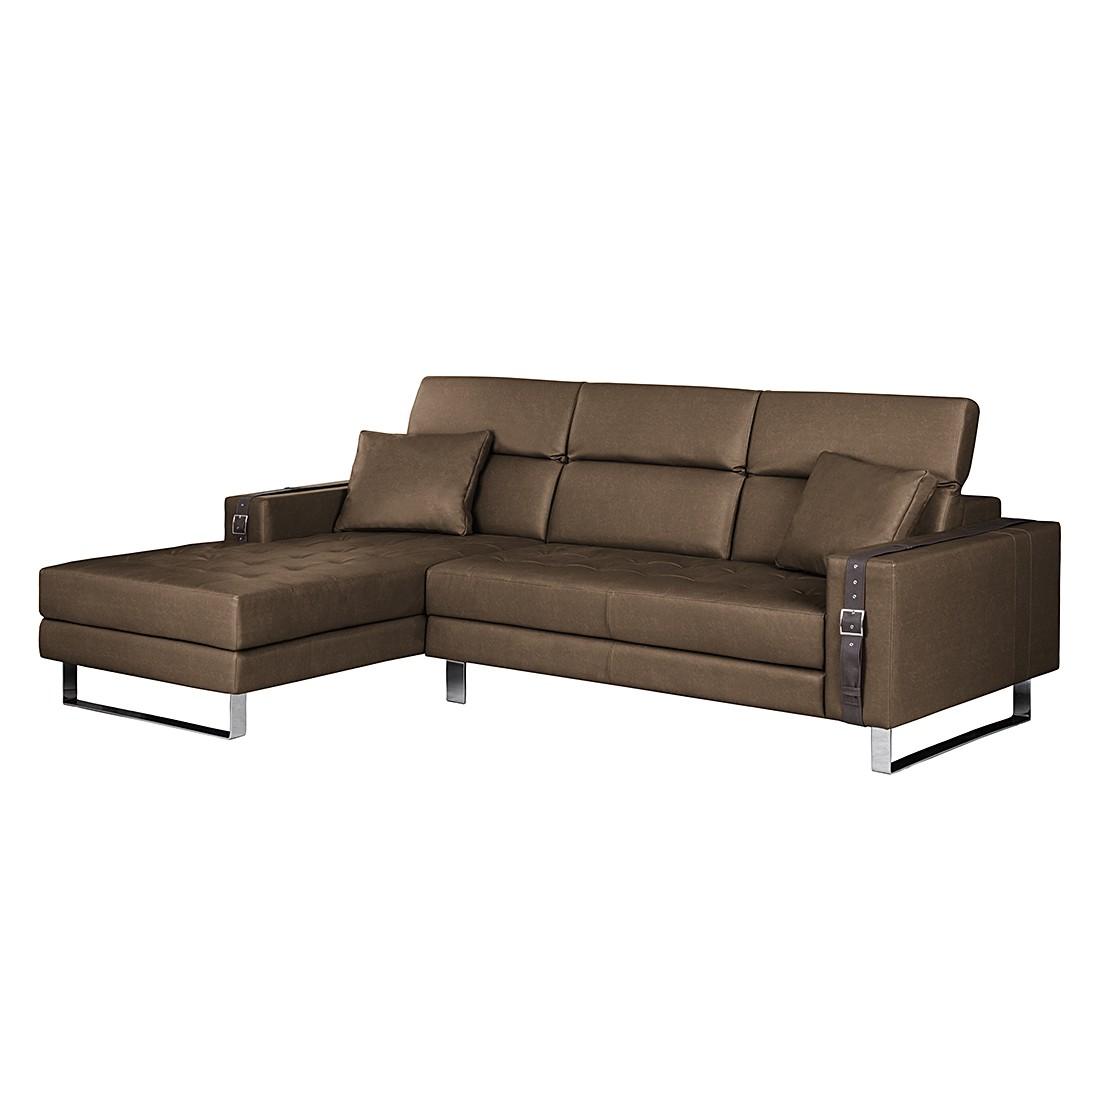 ecksofa connor kunstleder braun longchair davorstehend links loftscape g nstig kaufen. Black Bedroom Furniture Sets. Home Design Ideas